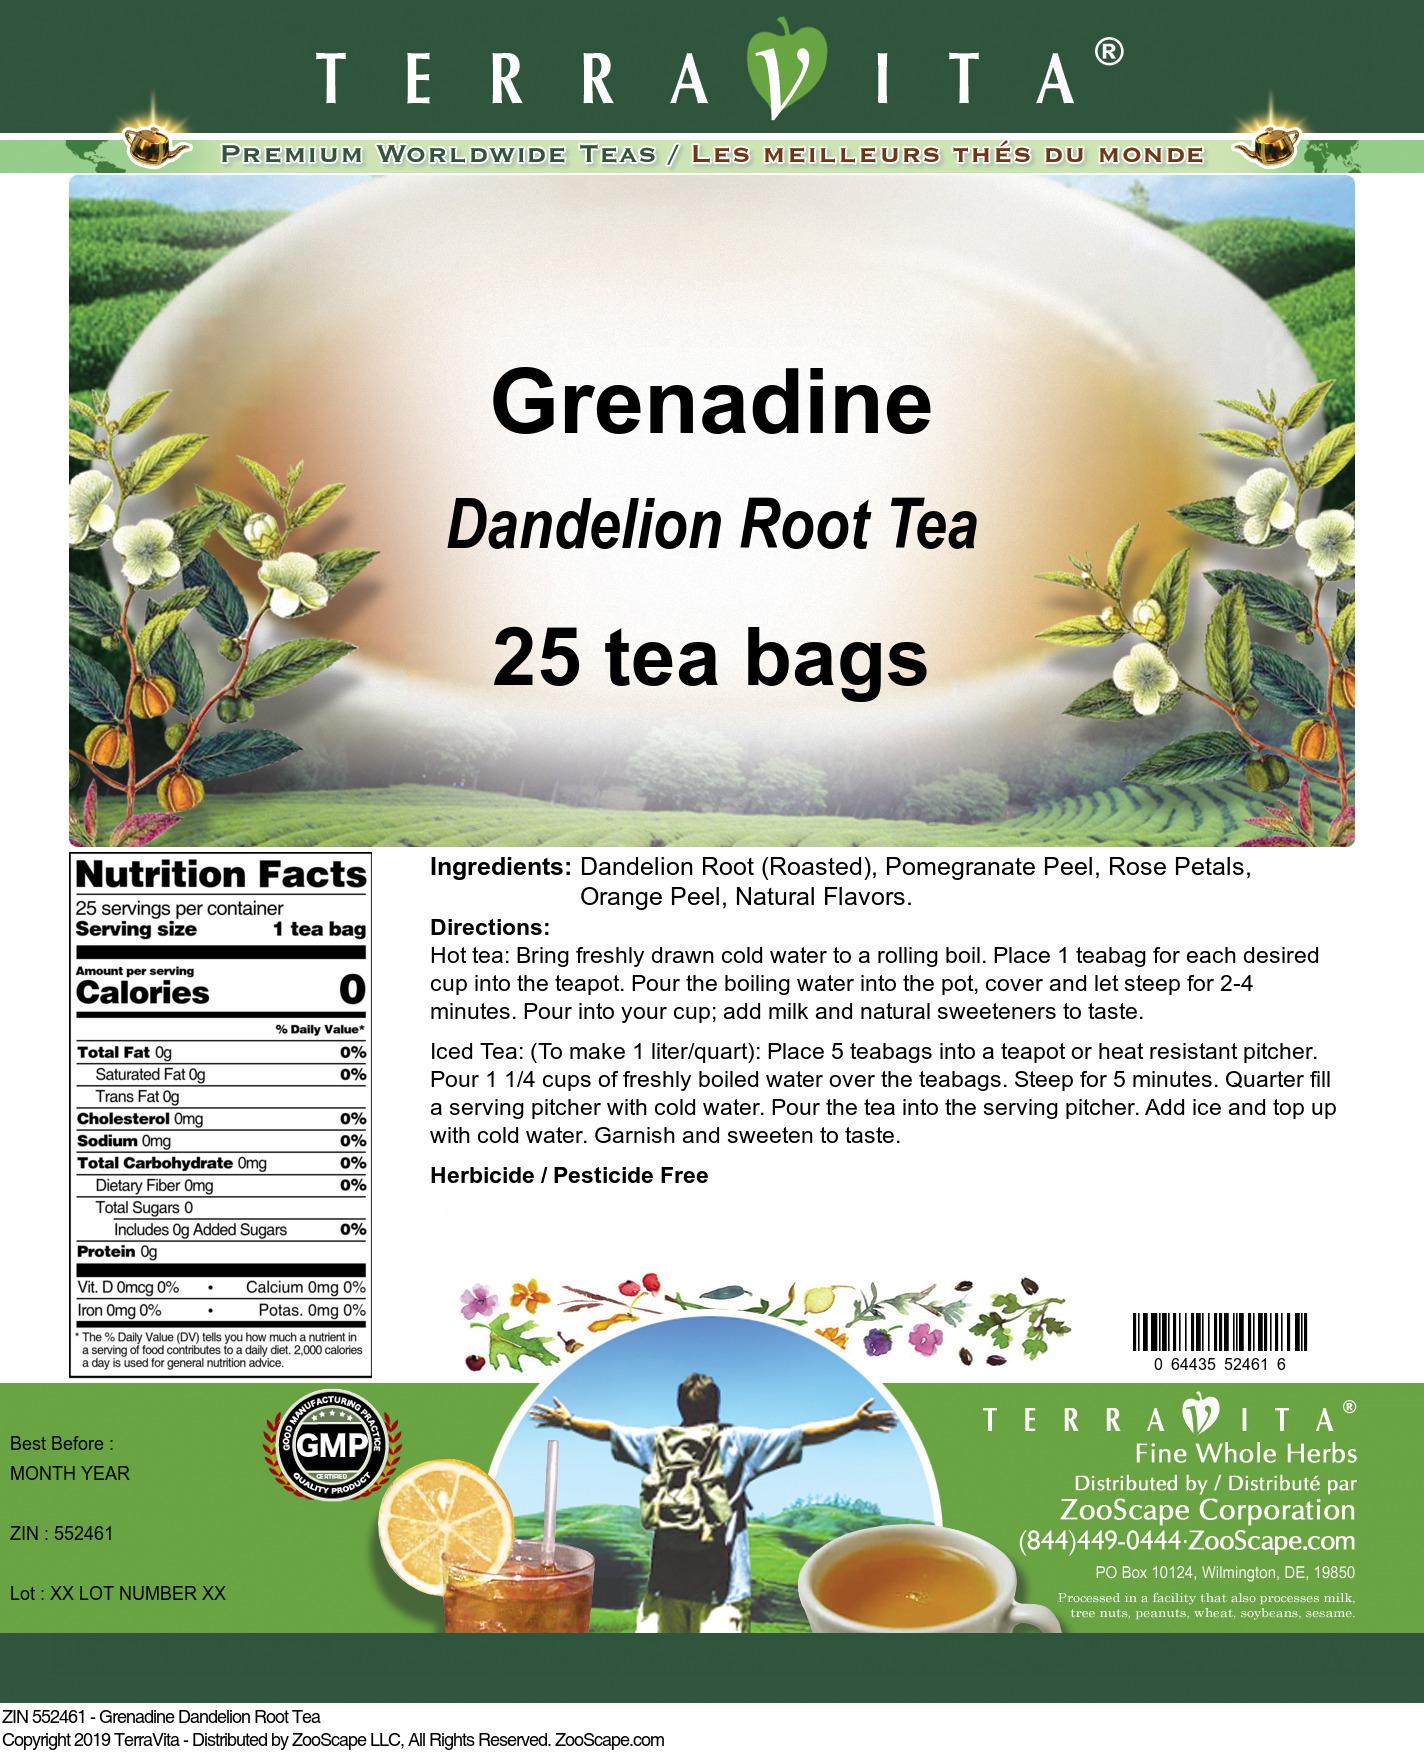 Grenadine Dandelion Root Tea